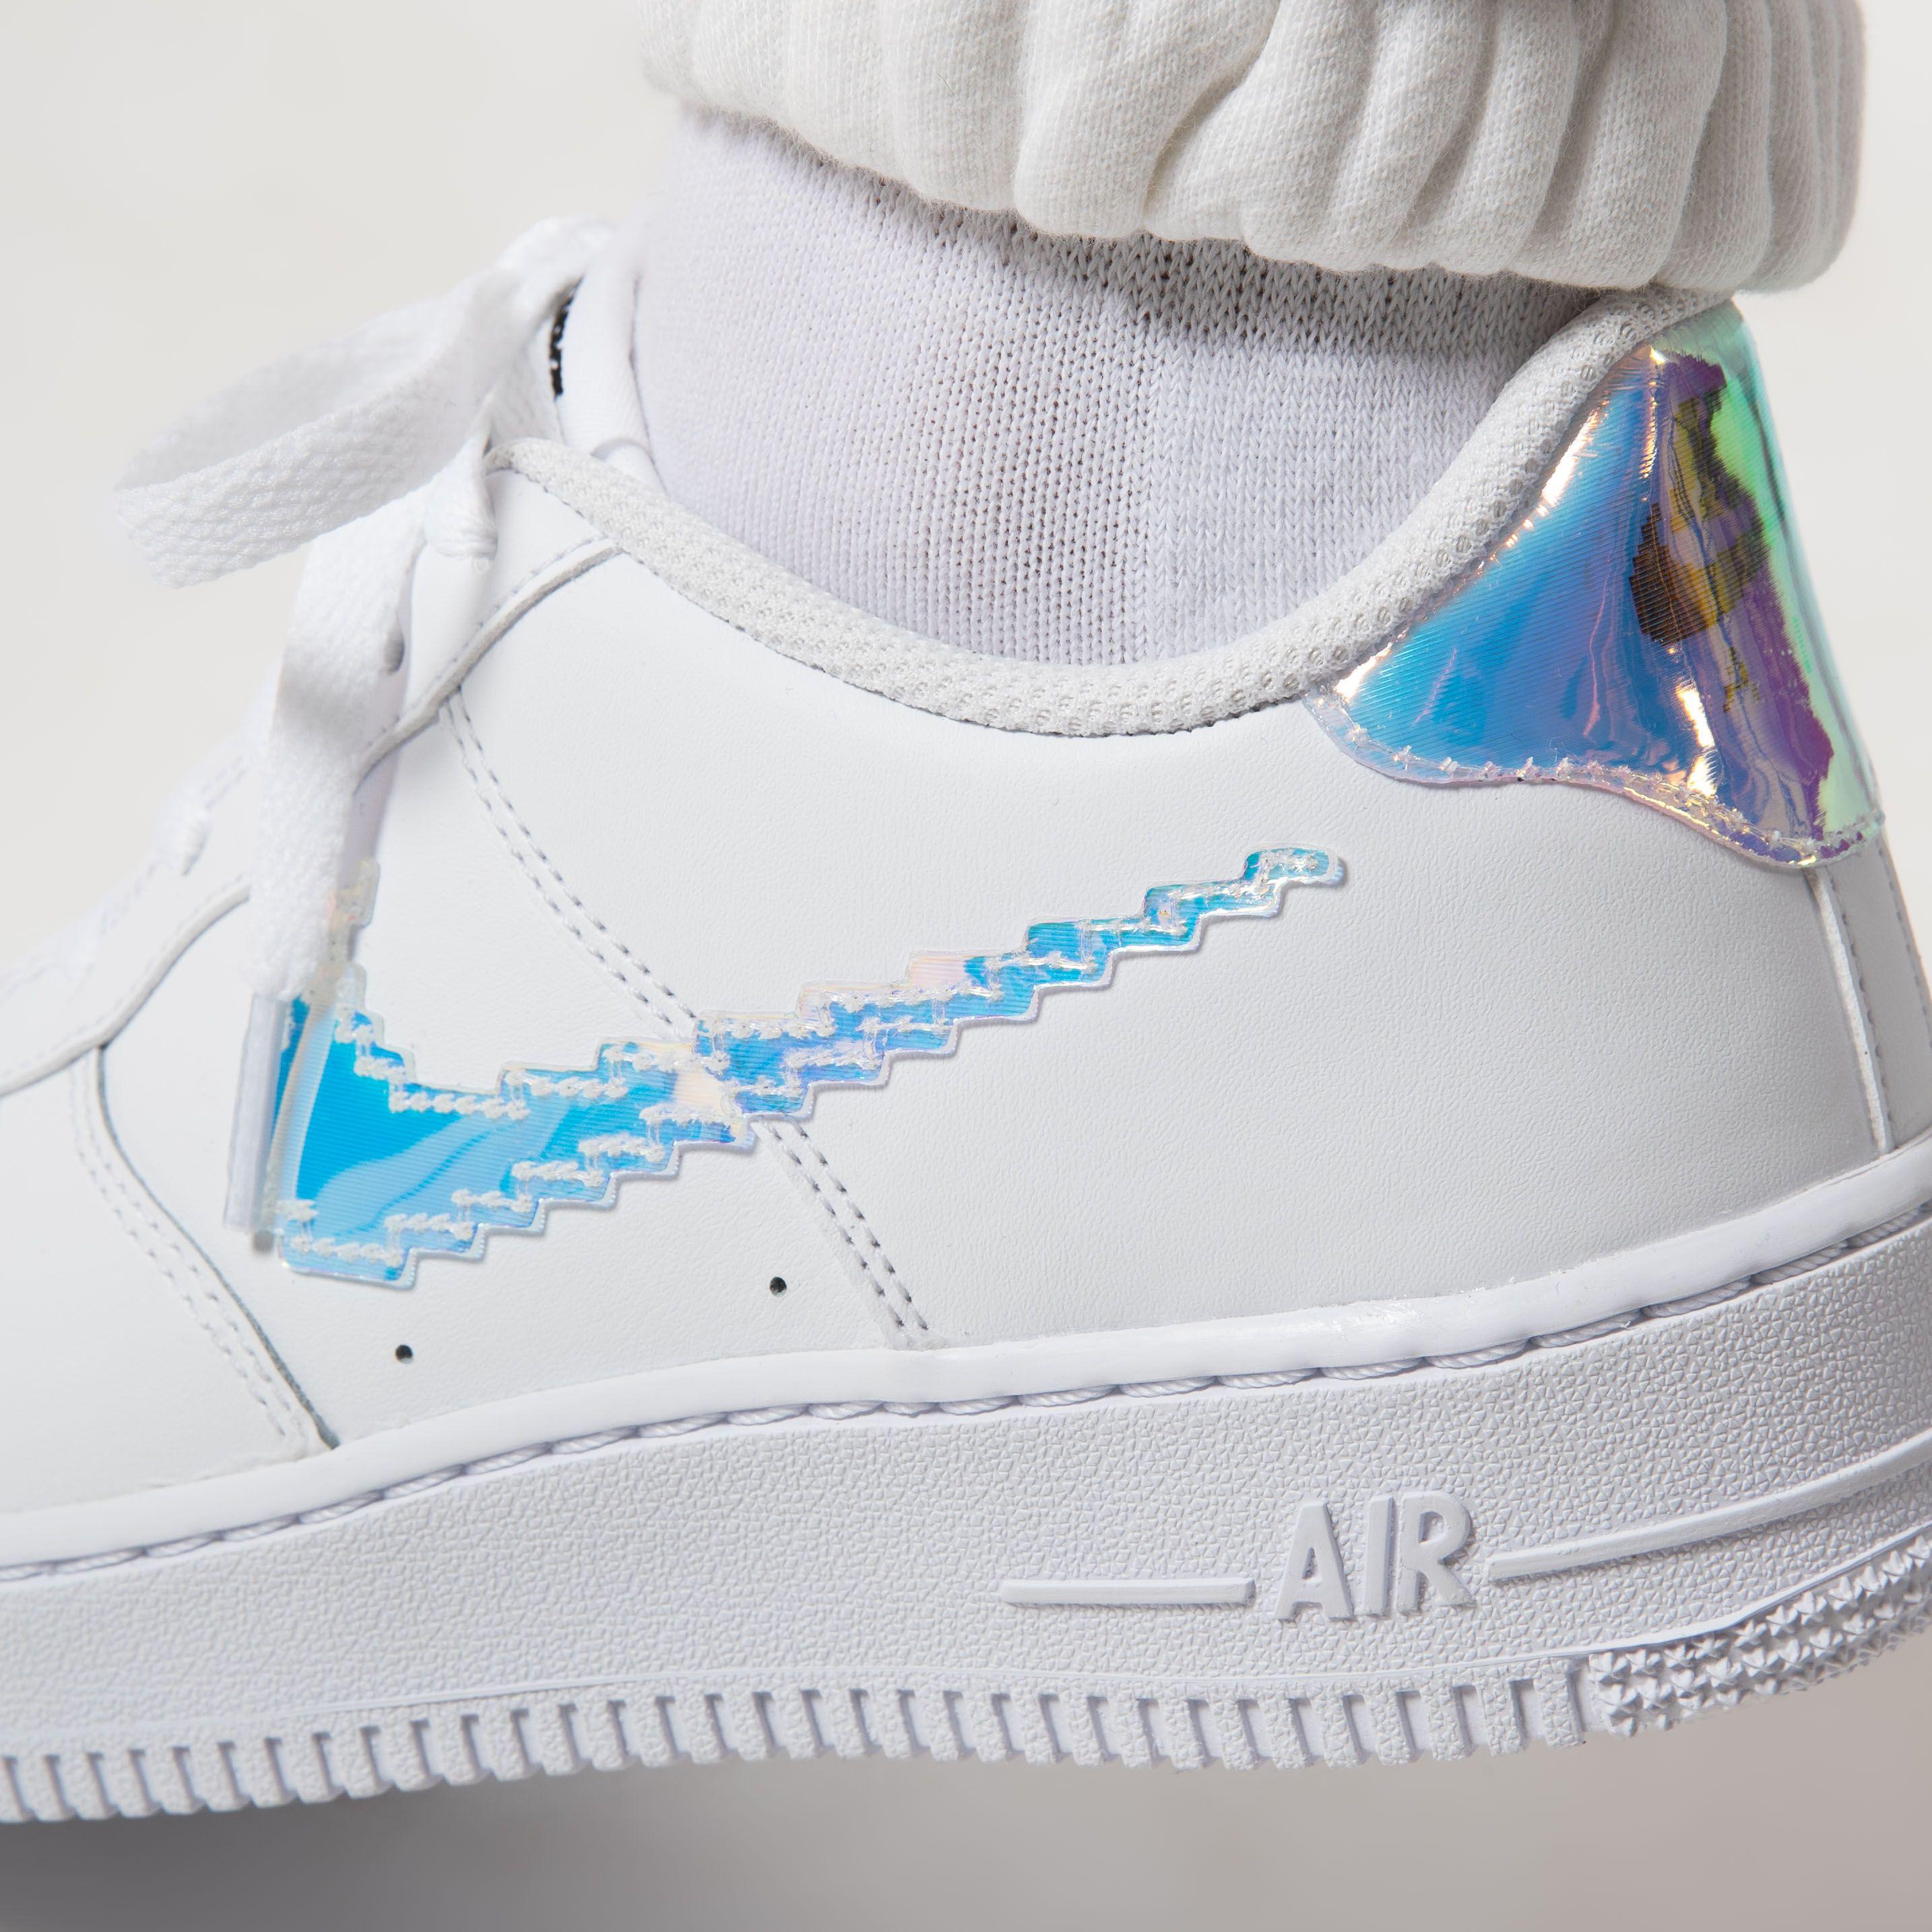 IMPACT Nike Air Force 1 LV8 全白 雷射鉤 炫彩 數碼 鐳射 仙杜瑞拉 CW1577-100